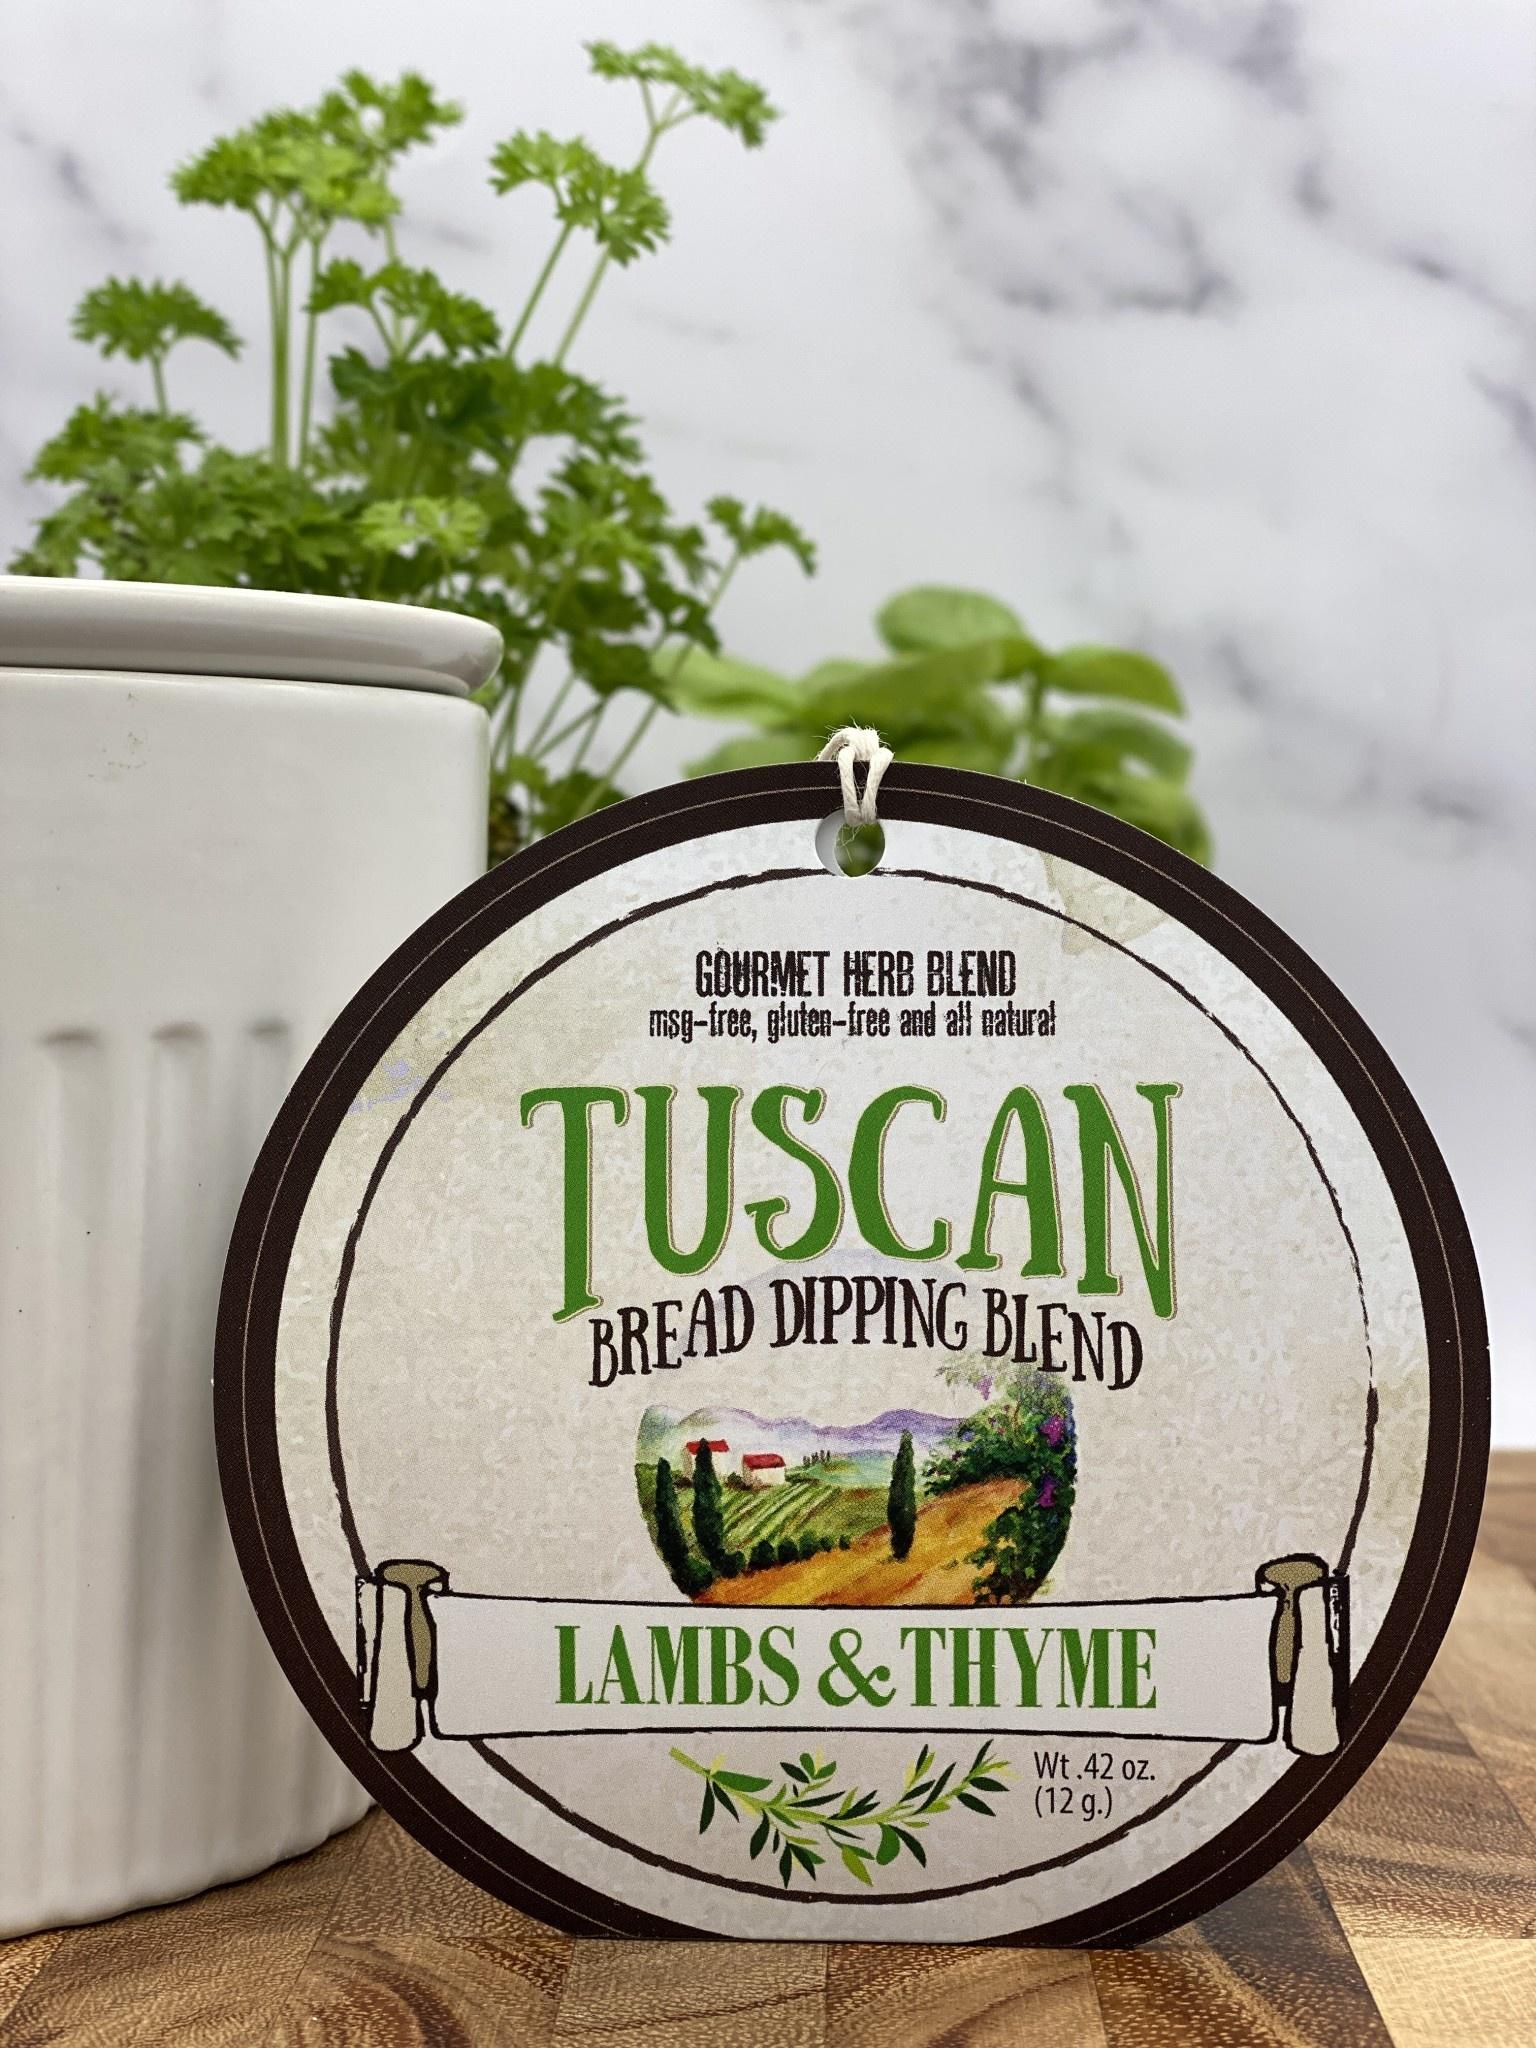 Lambs & Thyme Bread Dips Tuscan